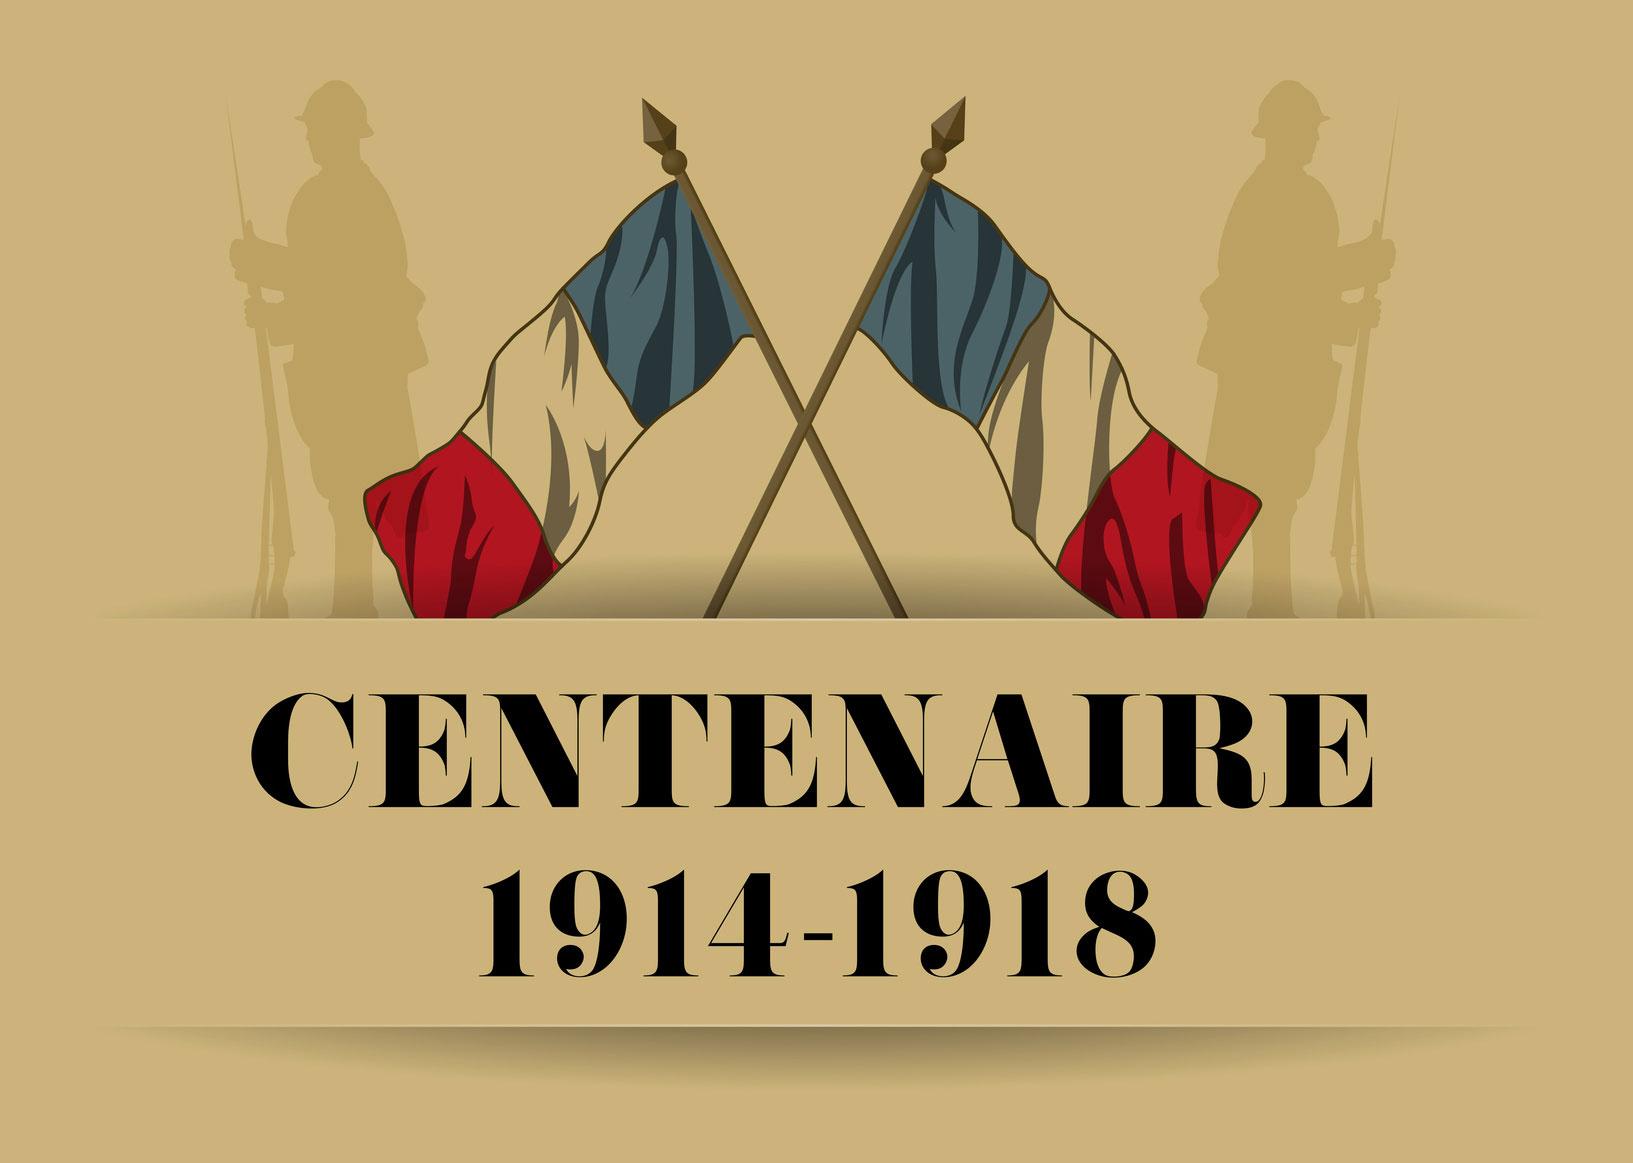 centenaire